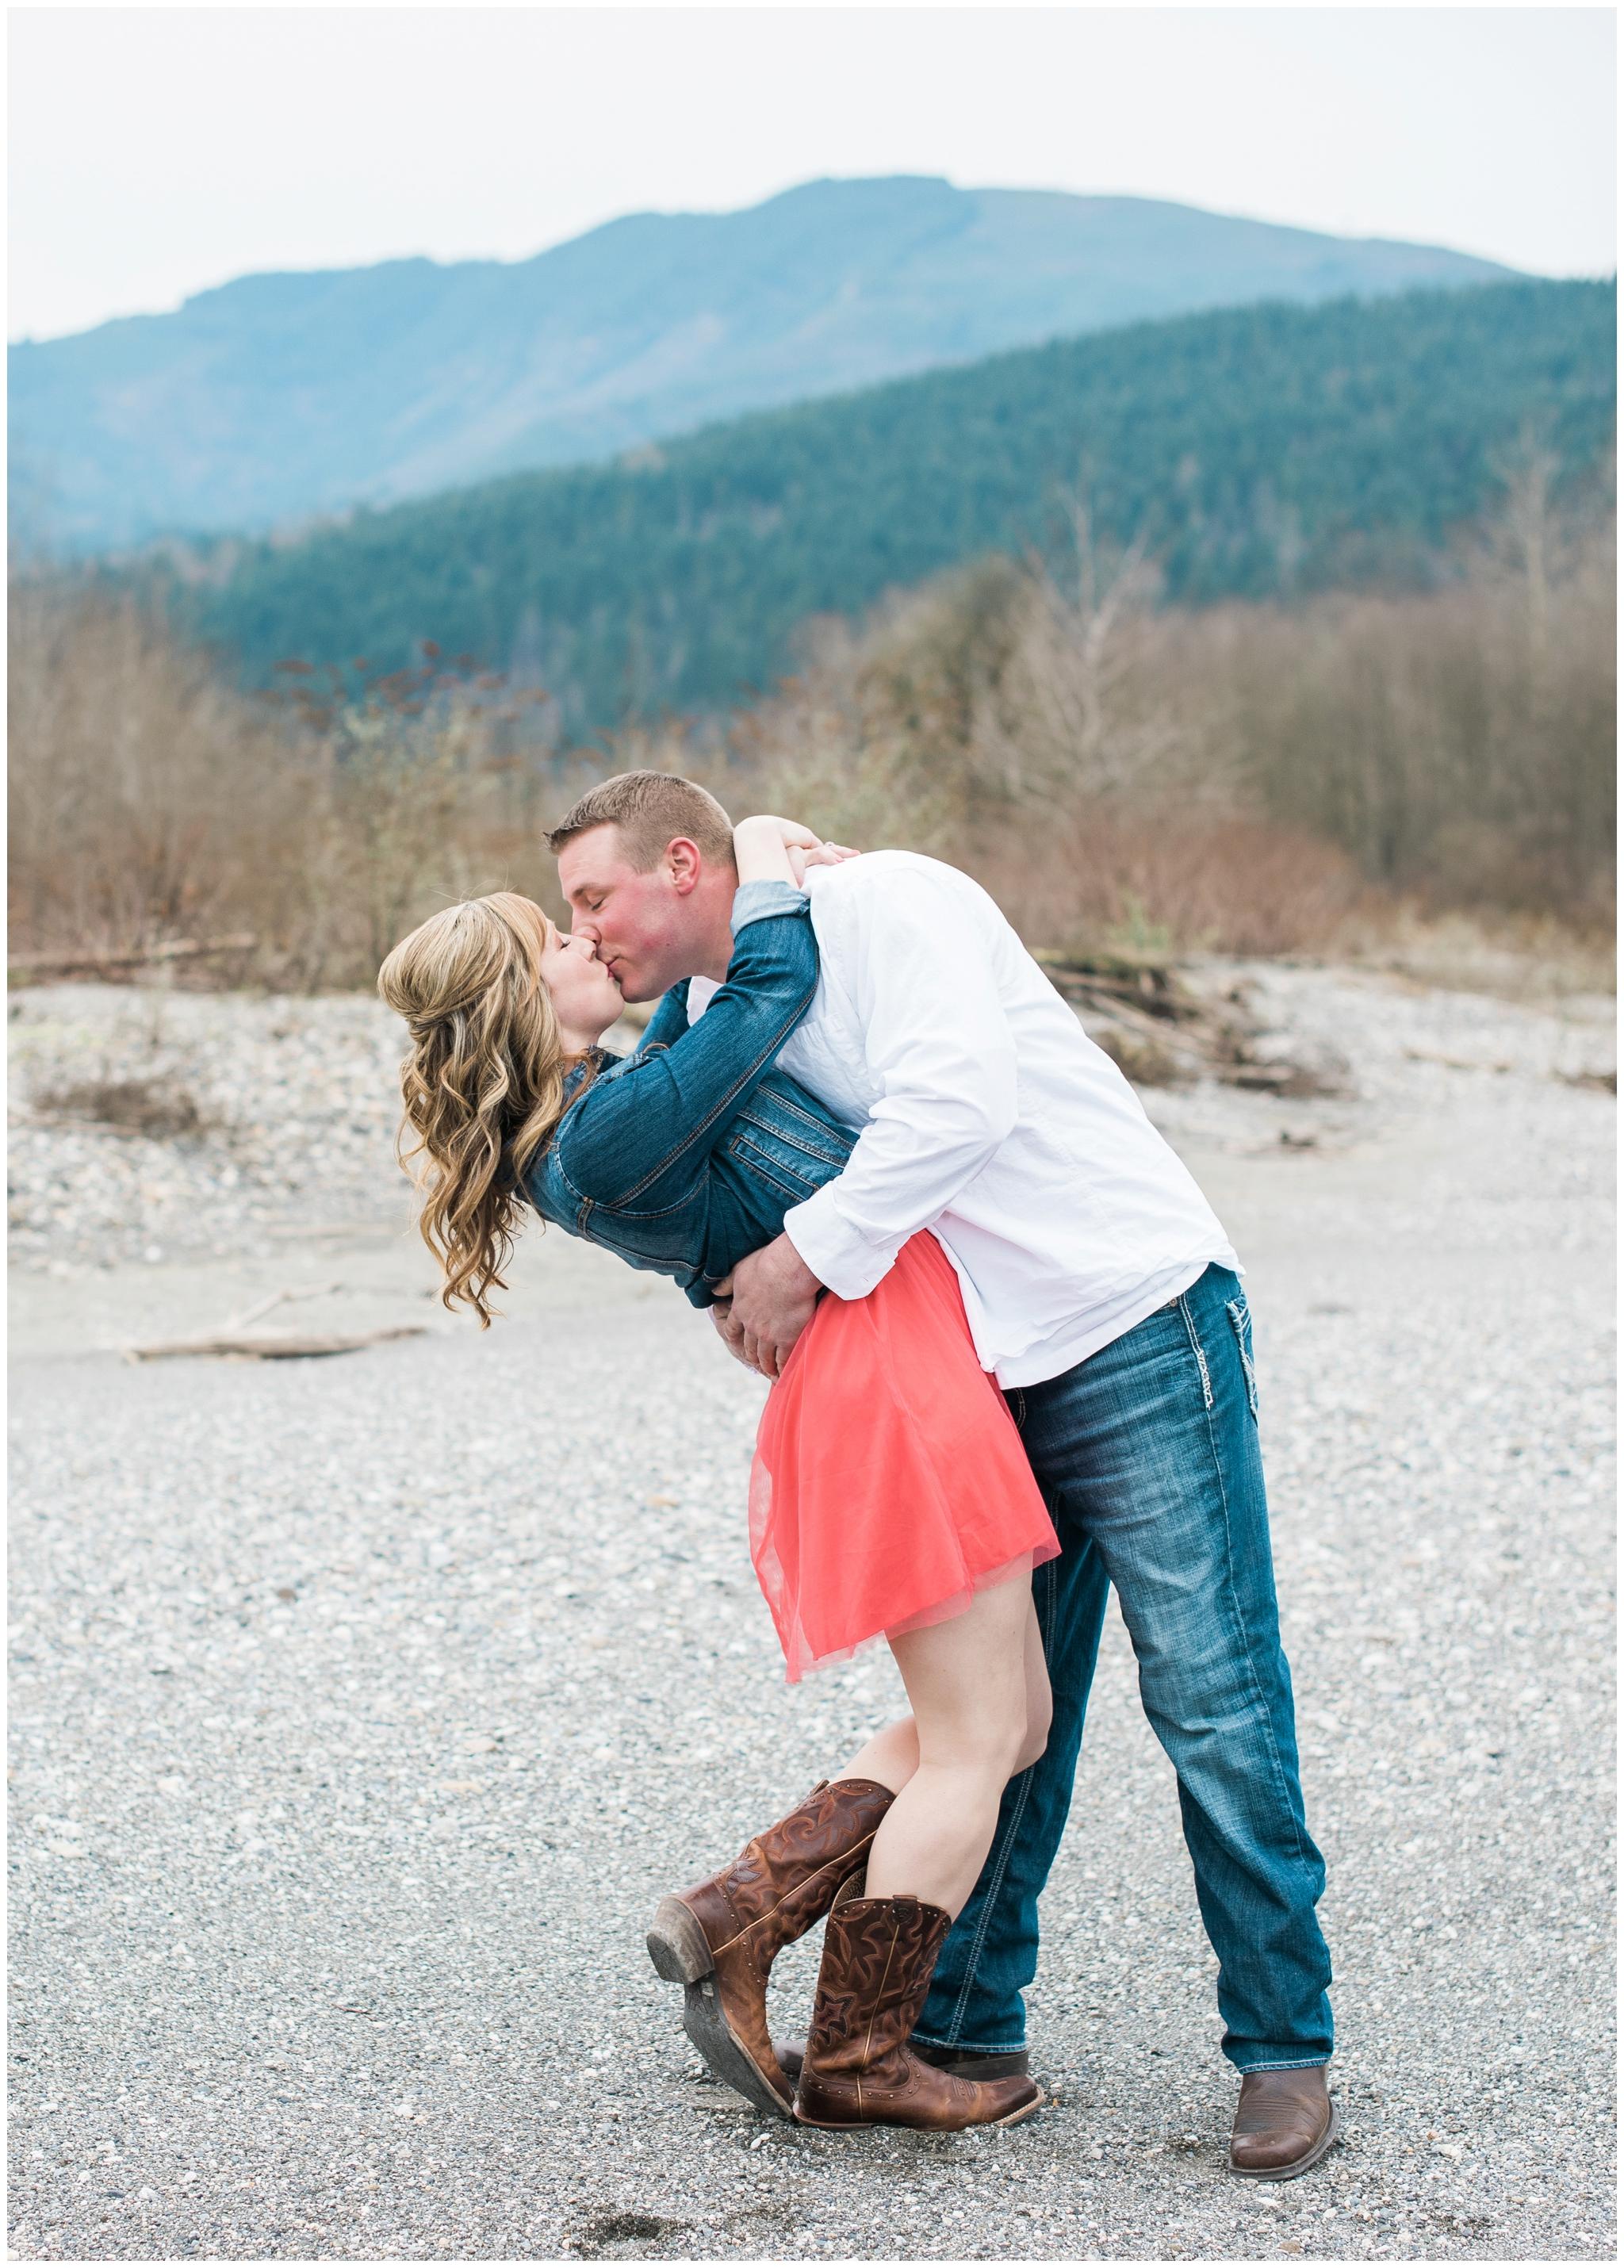 Bellingham river mountain Engagement, B. Jones Photography. Bellingham Wedding Photographer